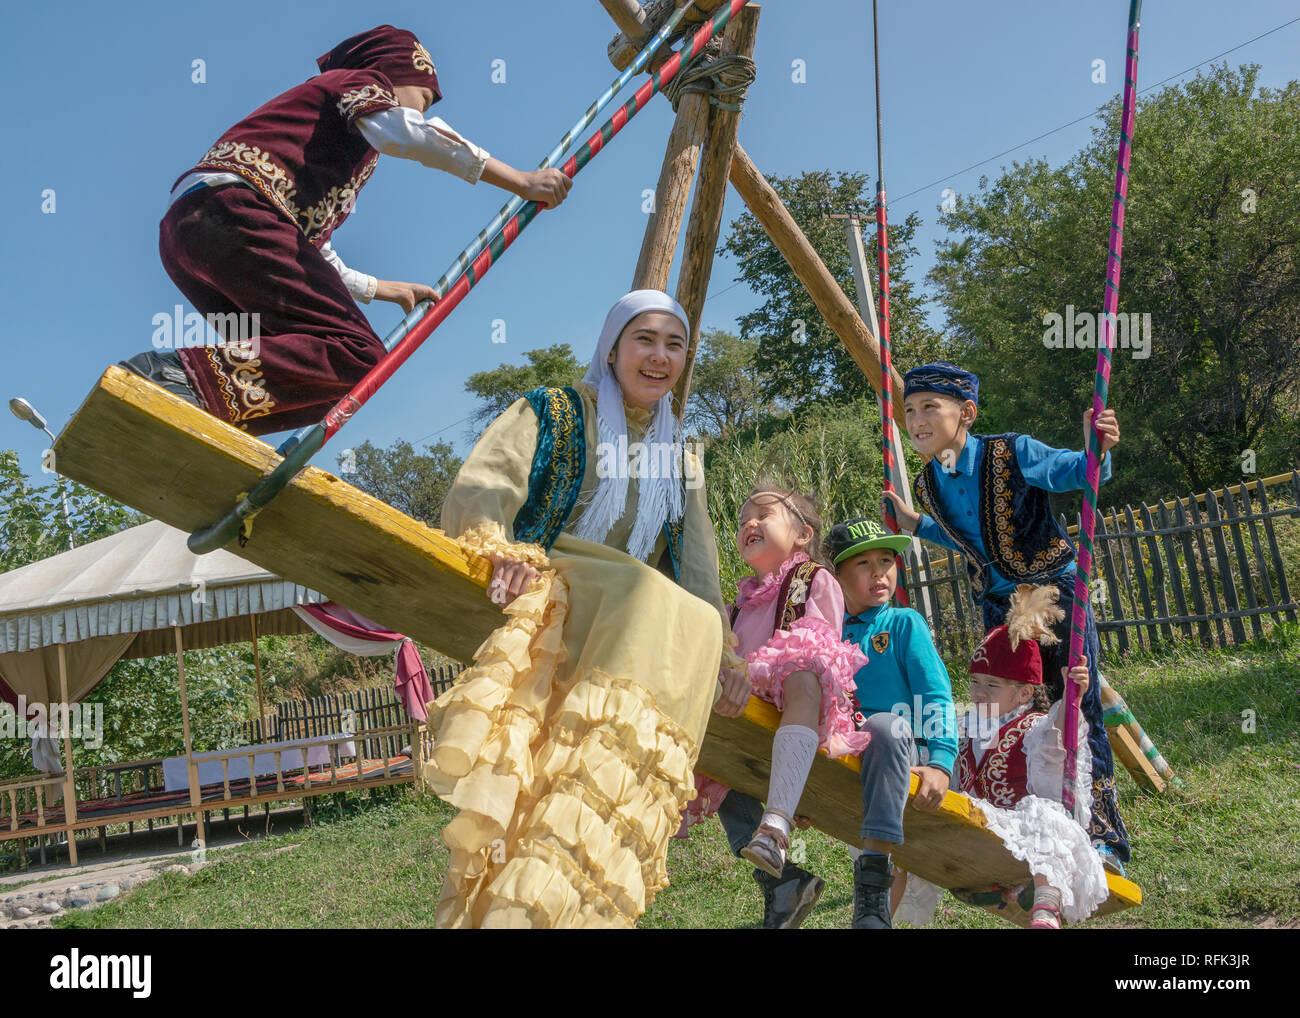 Fun on a swing, young Kazakhs in festive attire, Almaty, Kazakhstan - Stock Image